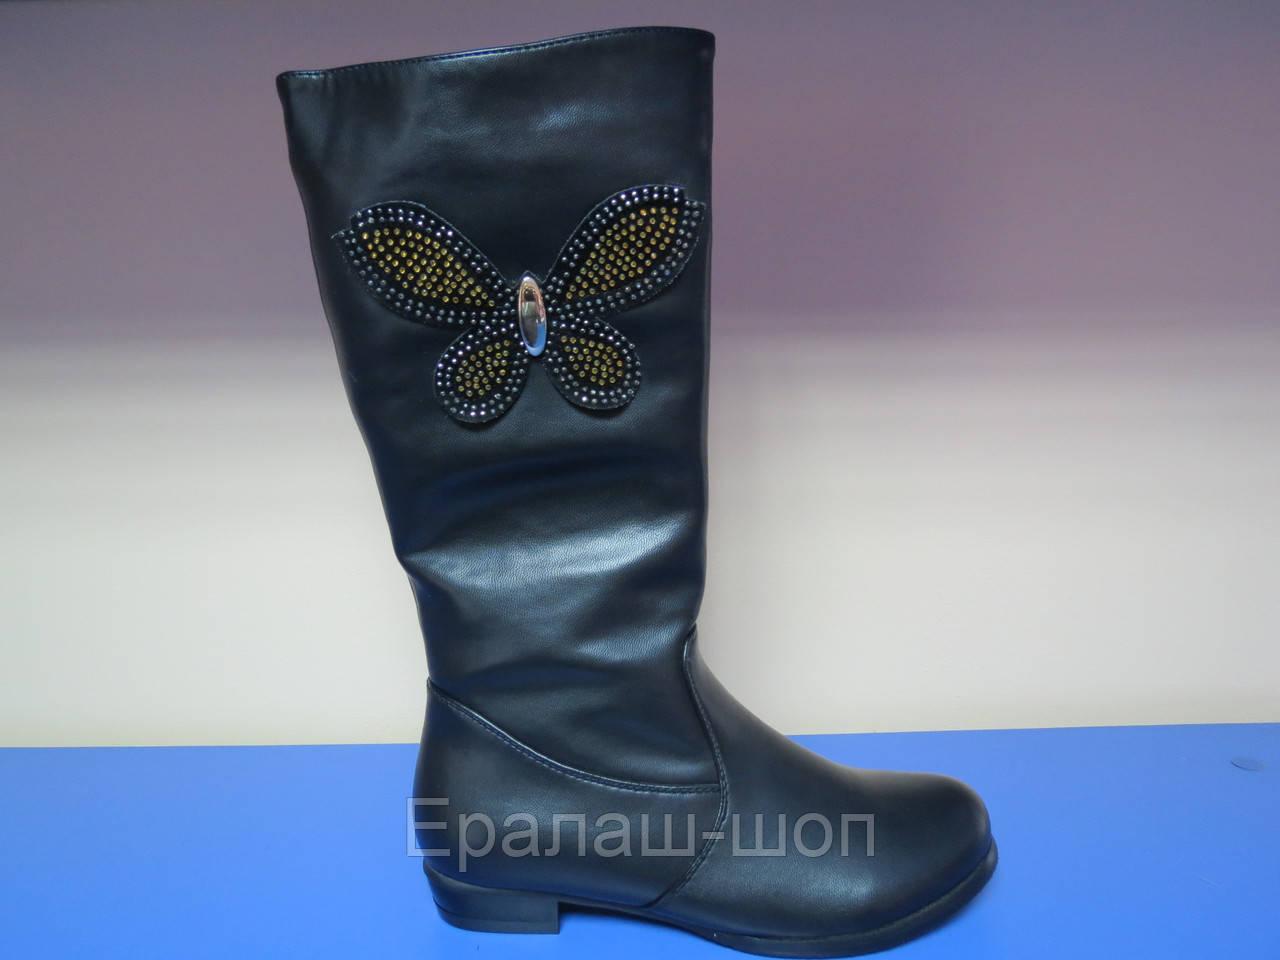 83a5202f9 Распродажа!Демисезонные сапоги/ботинки для девочки тм Arial 35р(22см стелька)  -